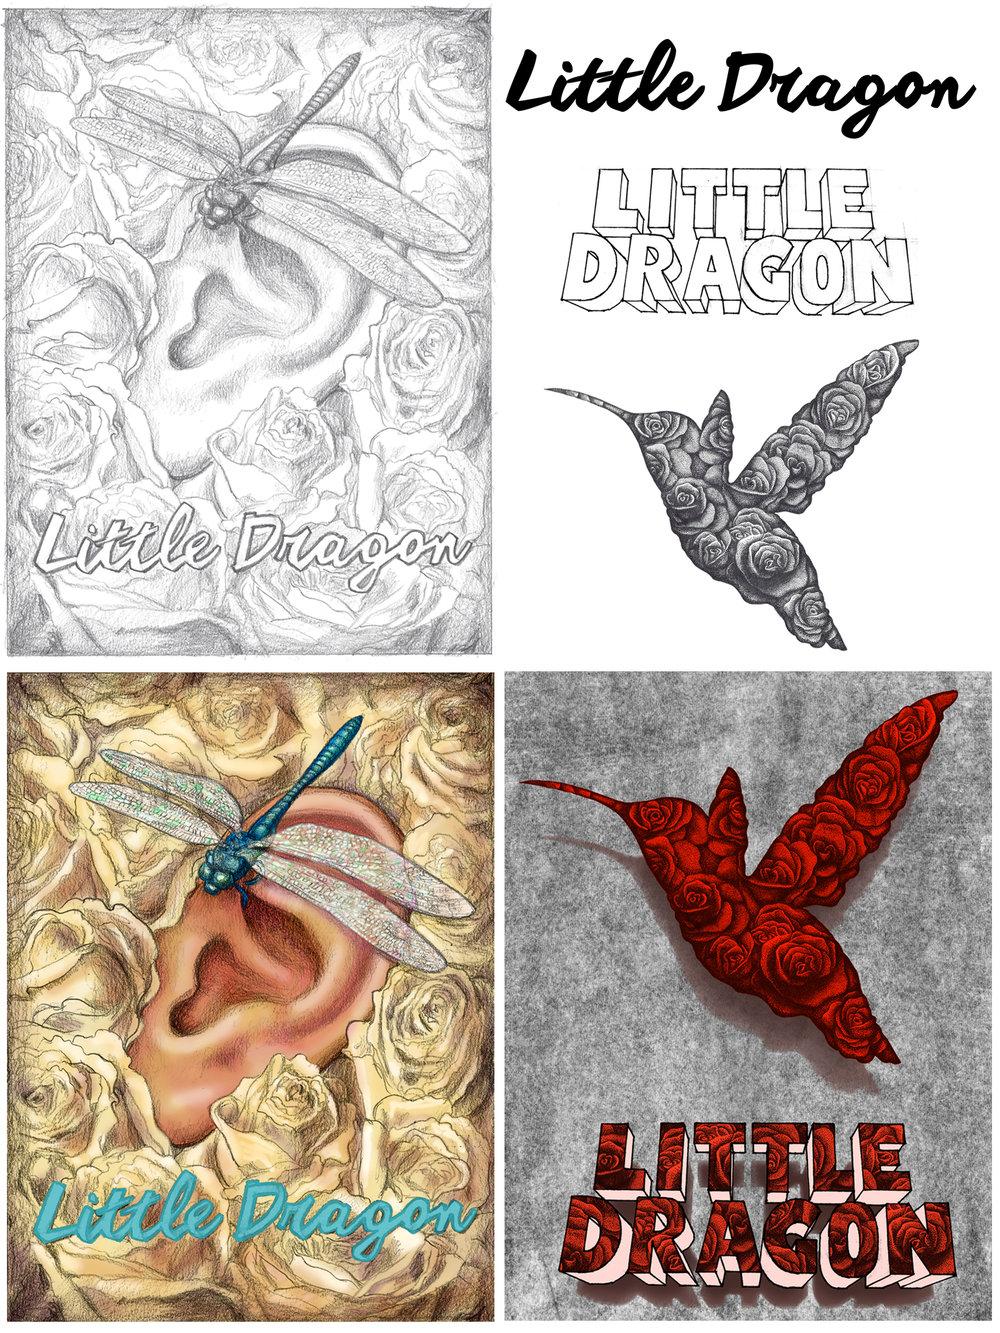 littledragon_sketches.jpg